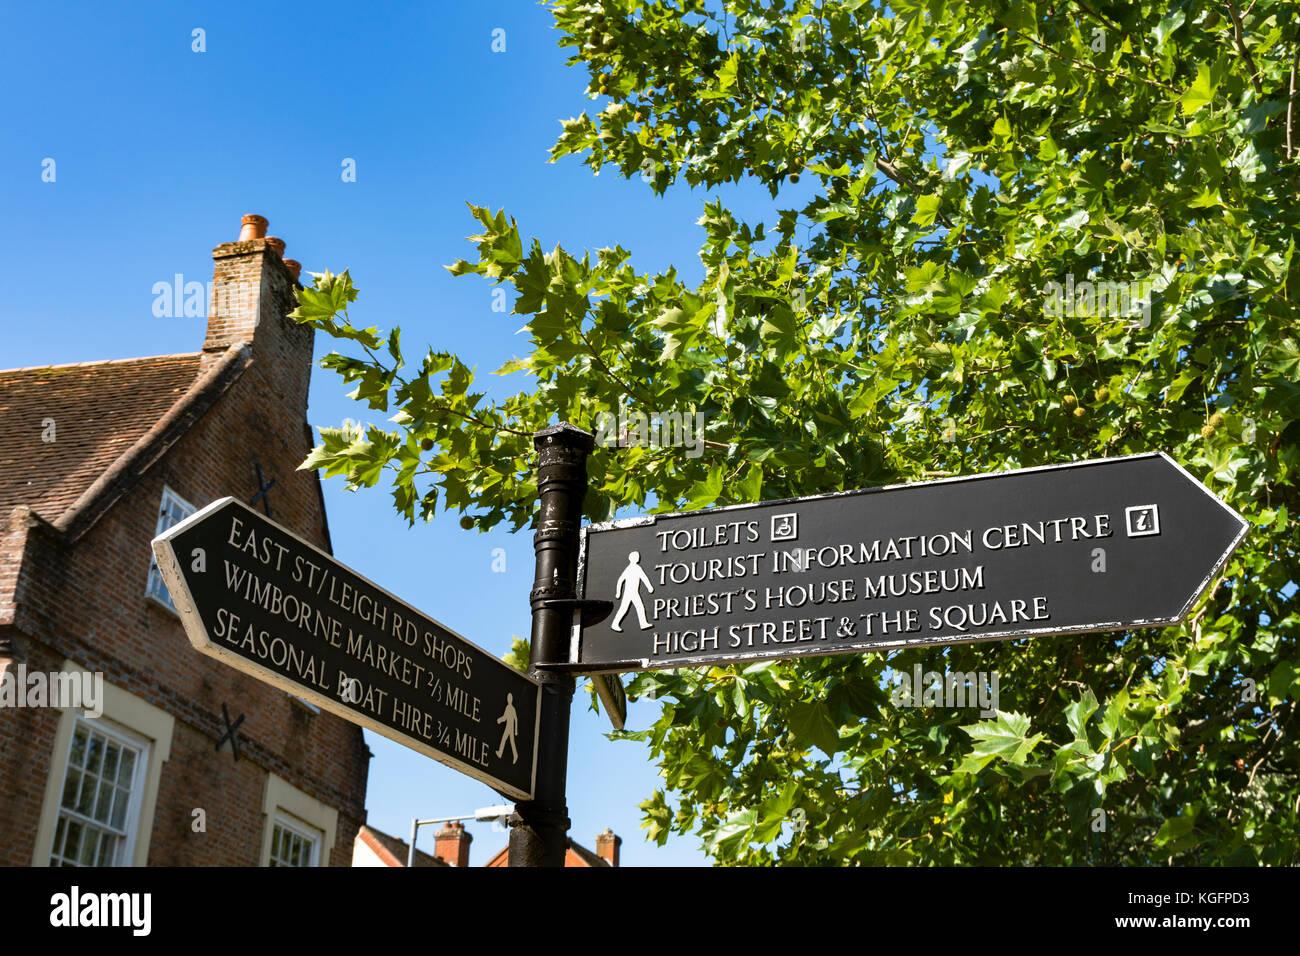 Tourist Information Sign, in Wimborne Minster, UK. - Stock Image